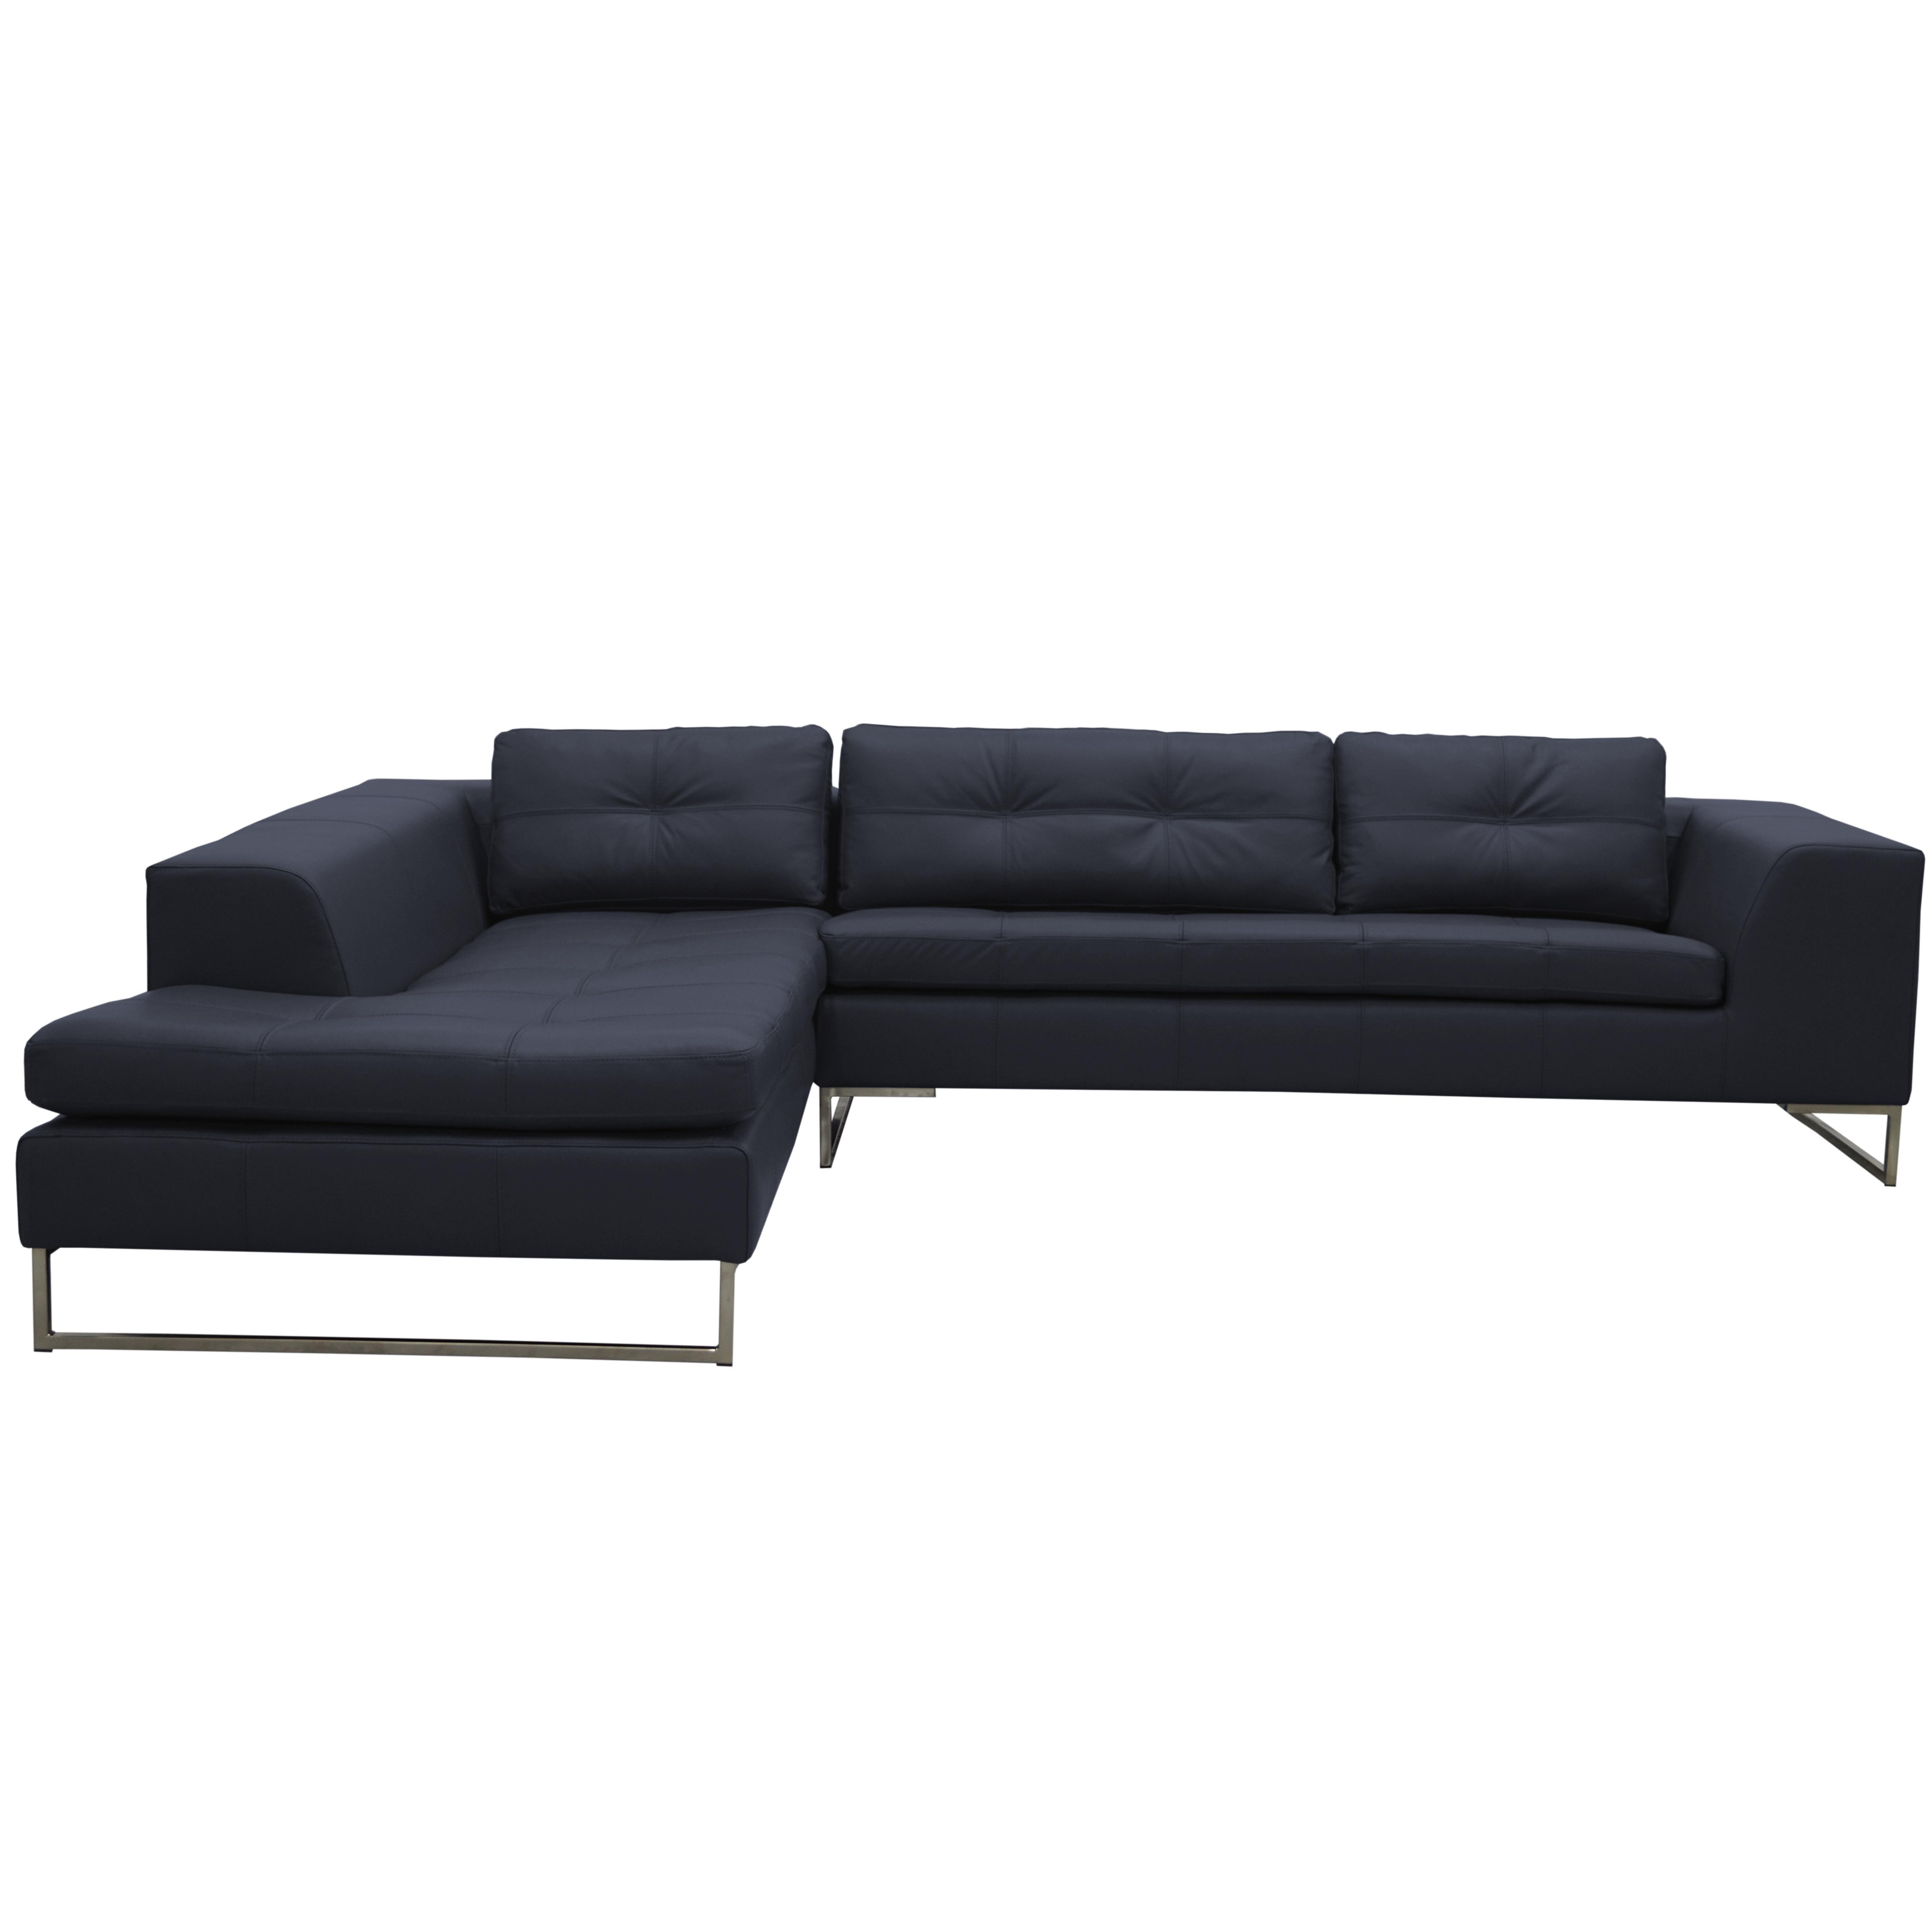 Toleda right hand facing arm corner sofa mollis leather petrol blue